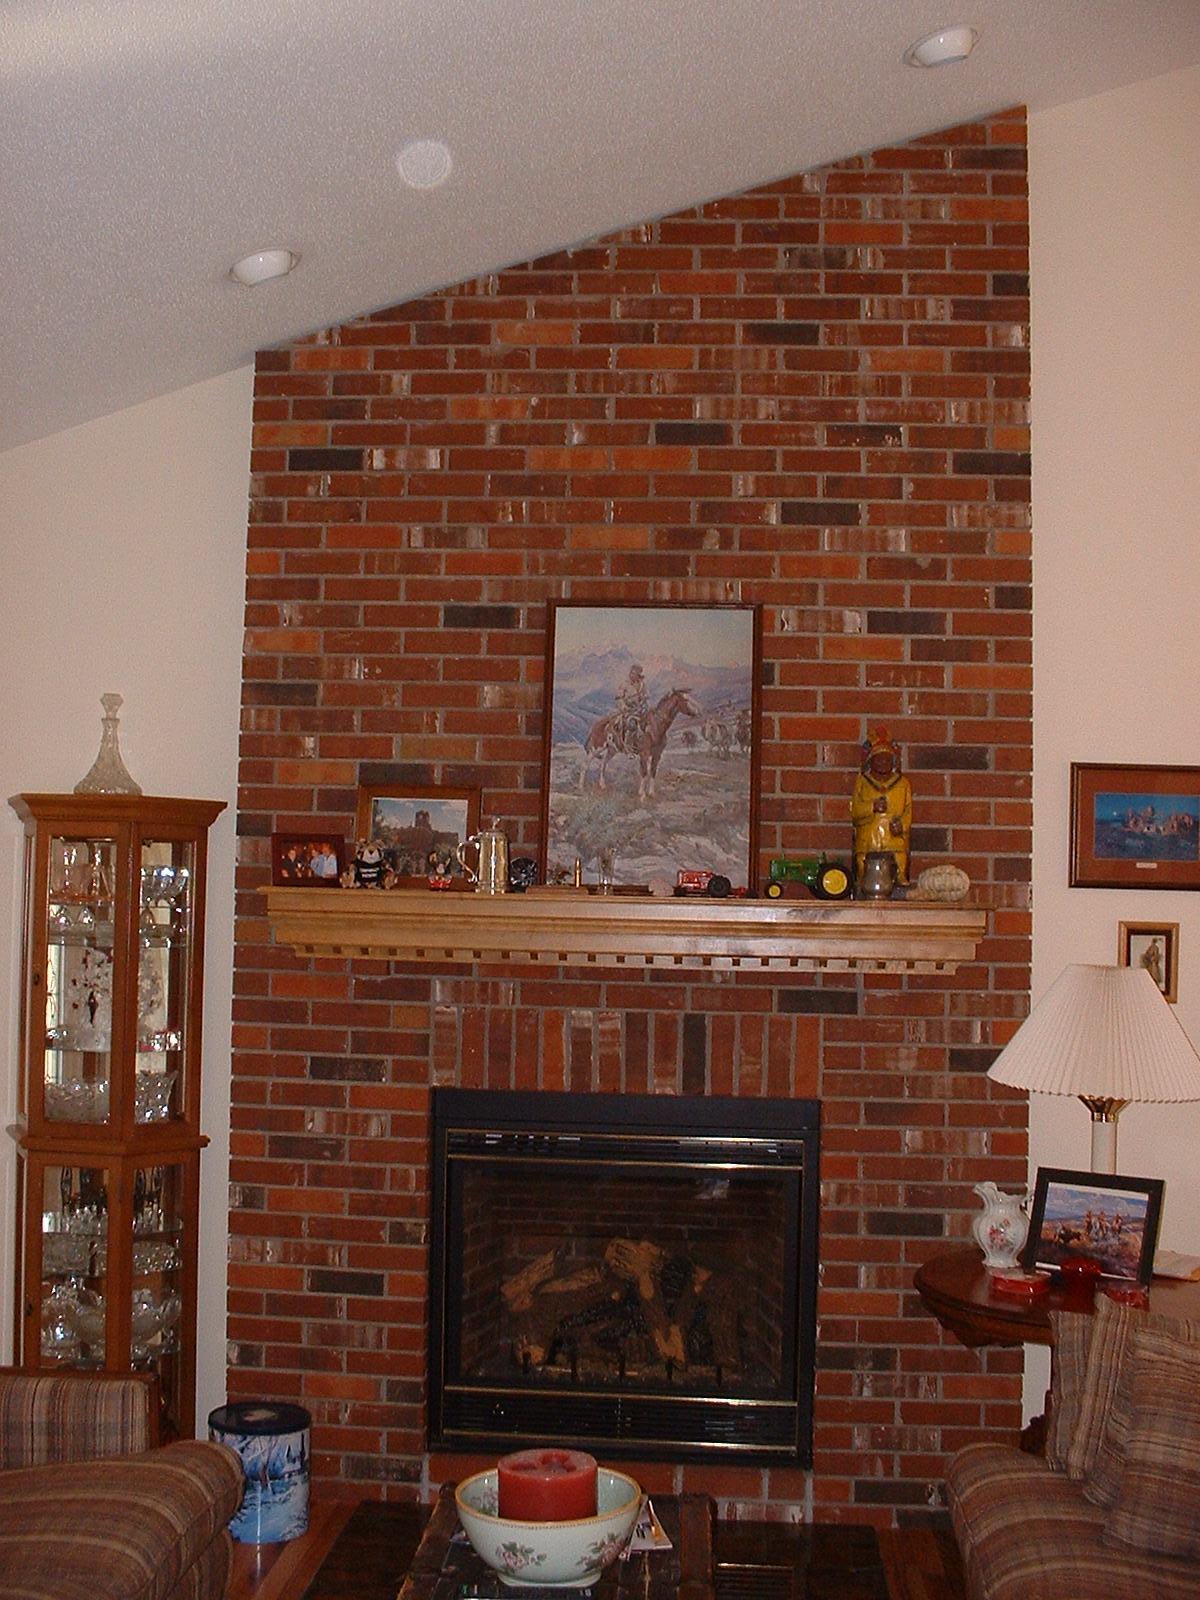 Stone Brick Veneer: Brick Box Image: Red Brick Veneer